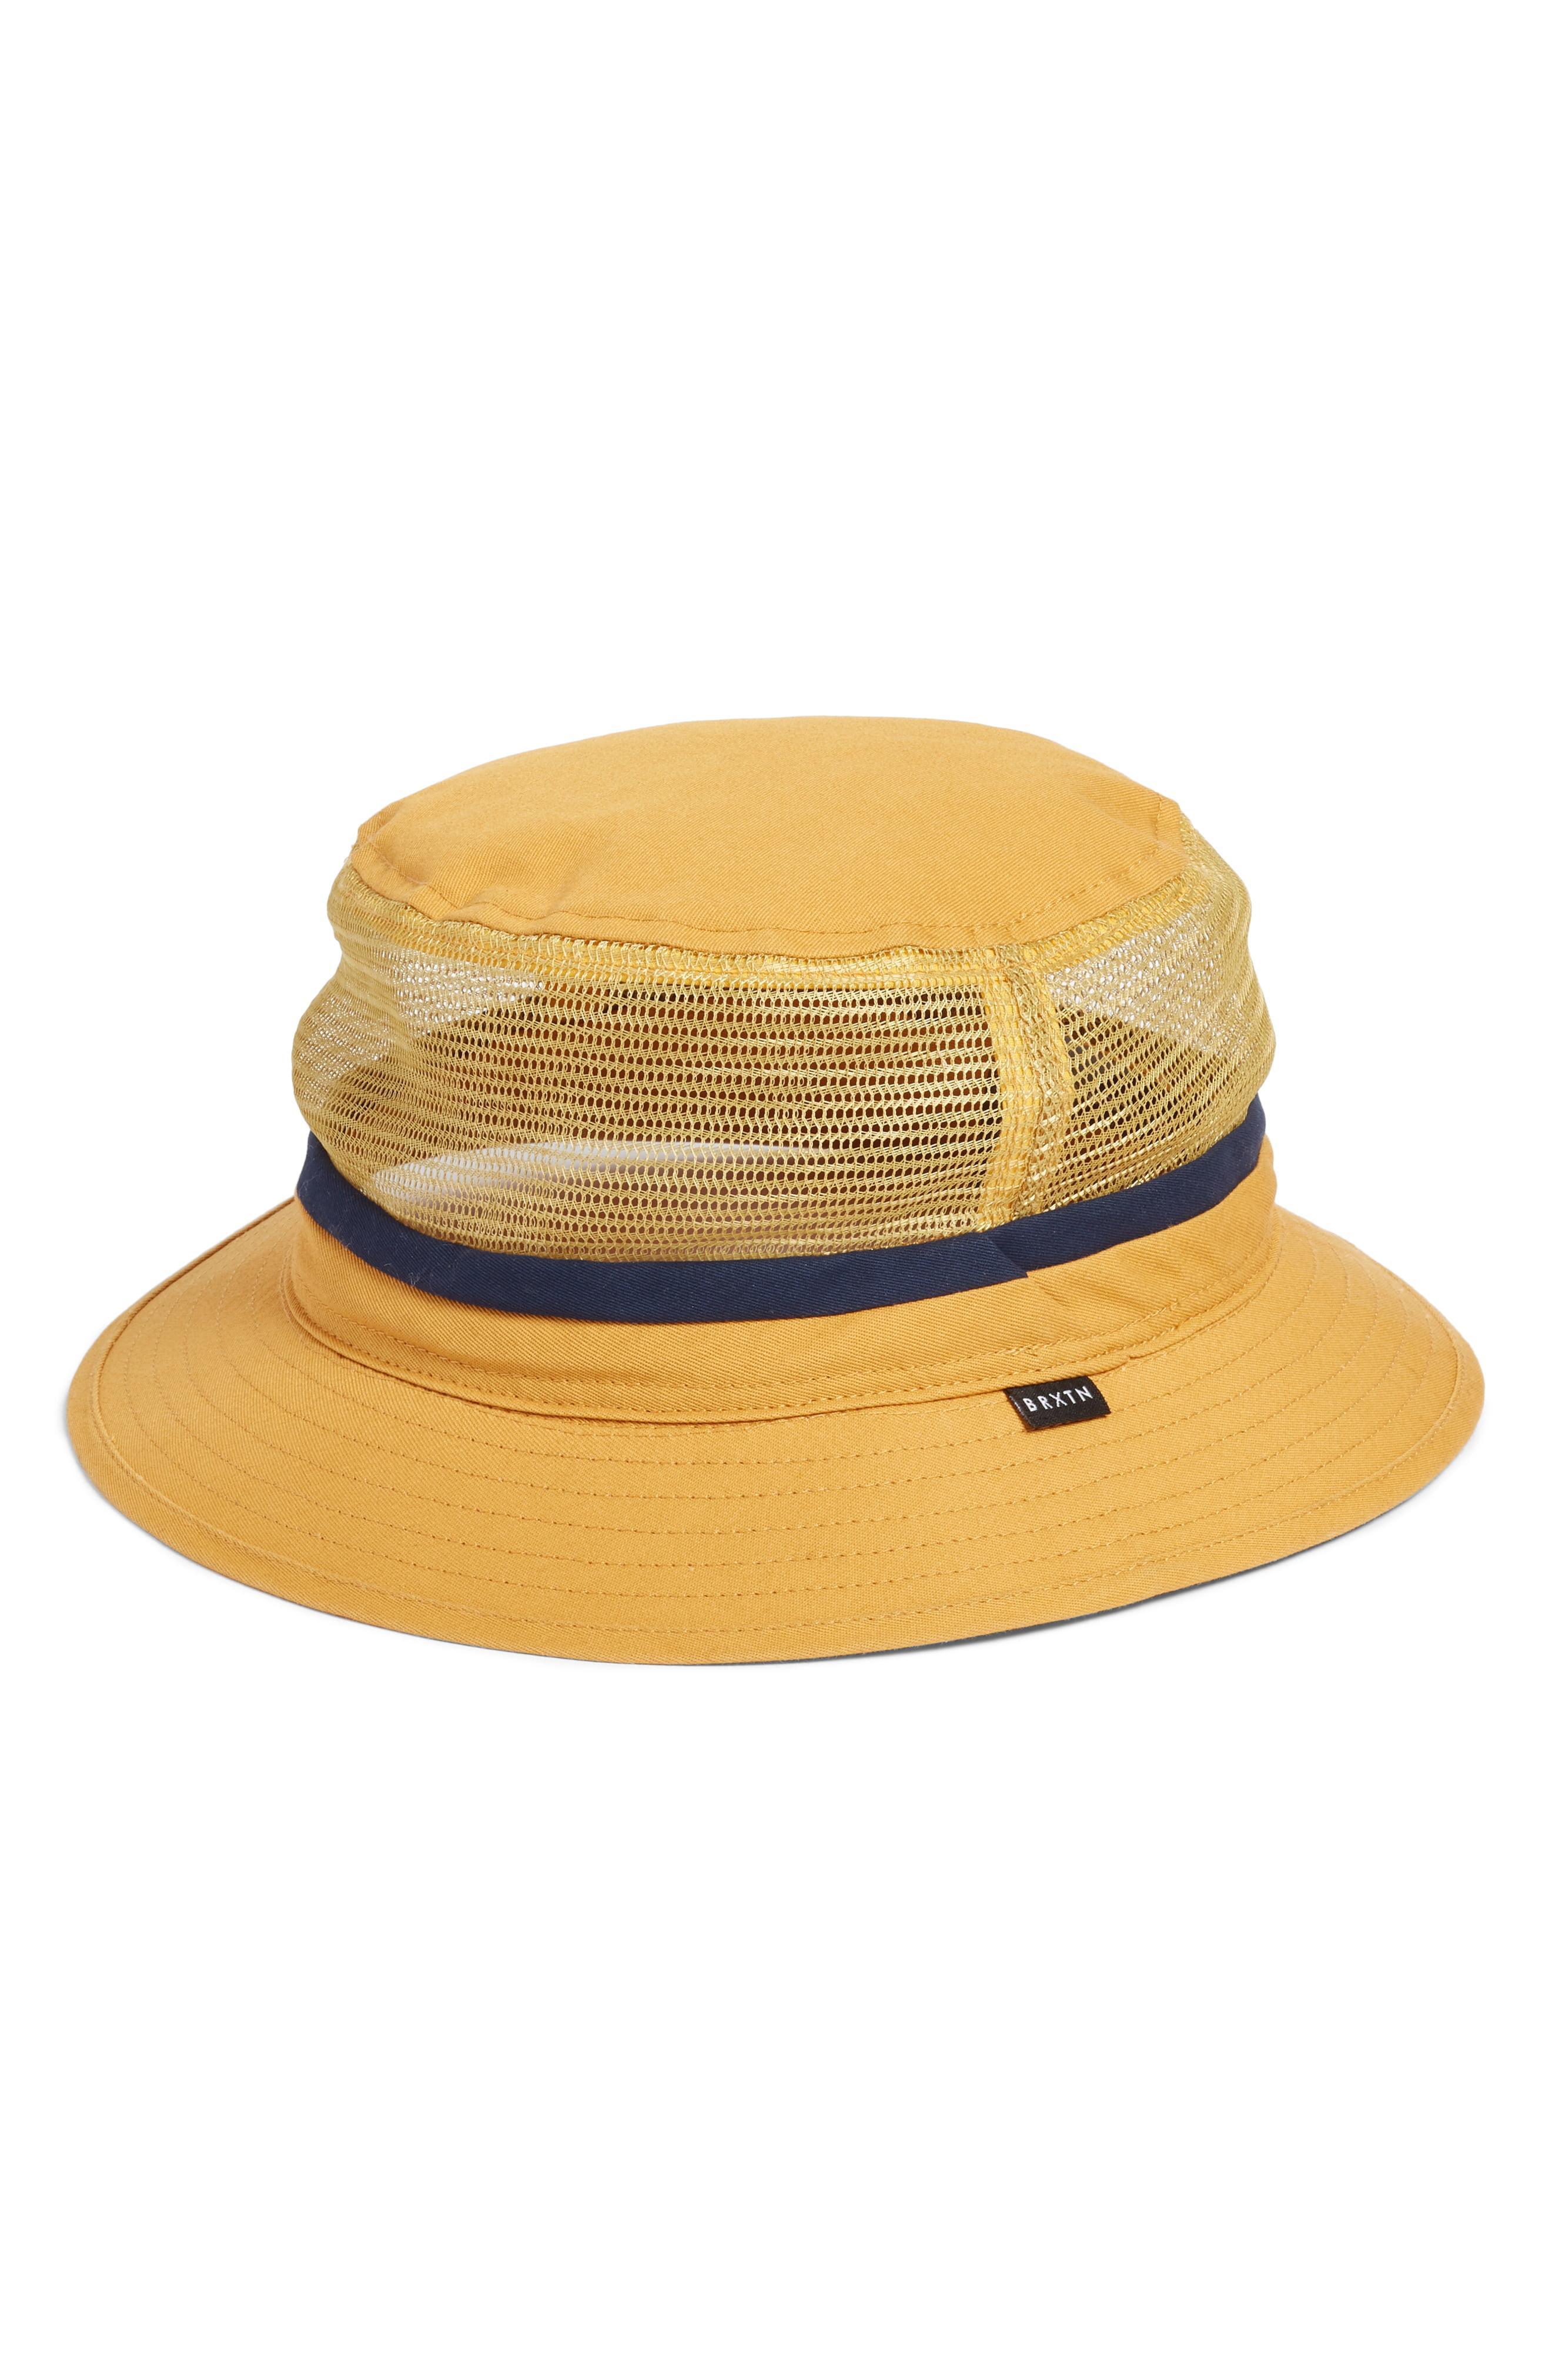 0158aef07 Lyst - Brixton Hardy Mesh Inset Bucket Hat - in Black for Men